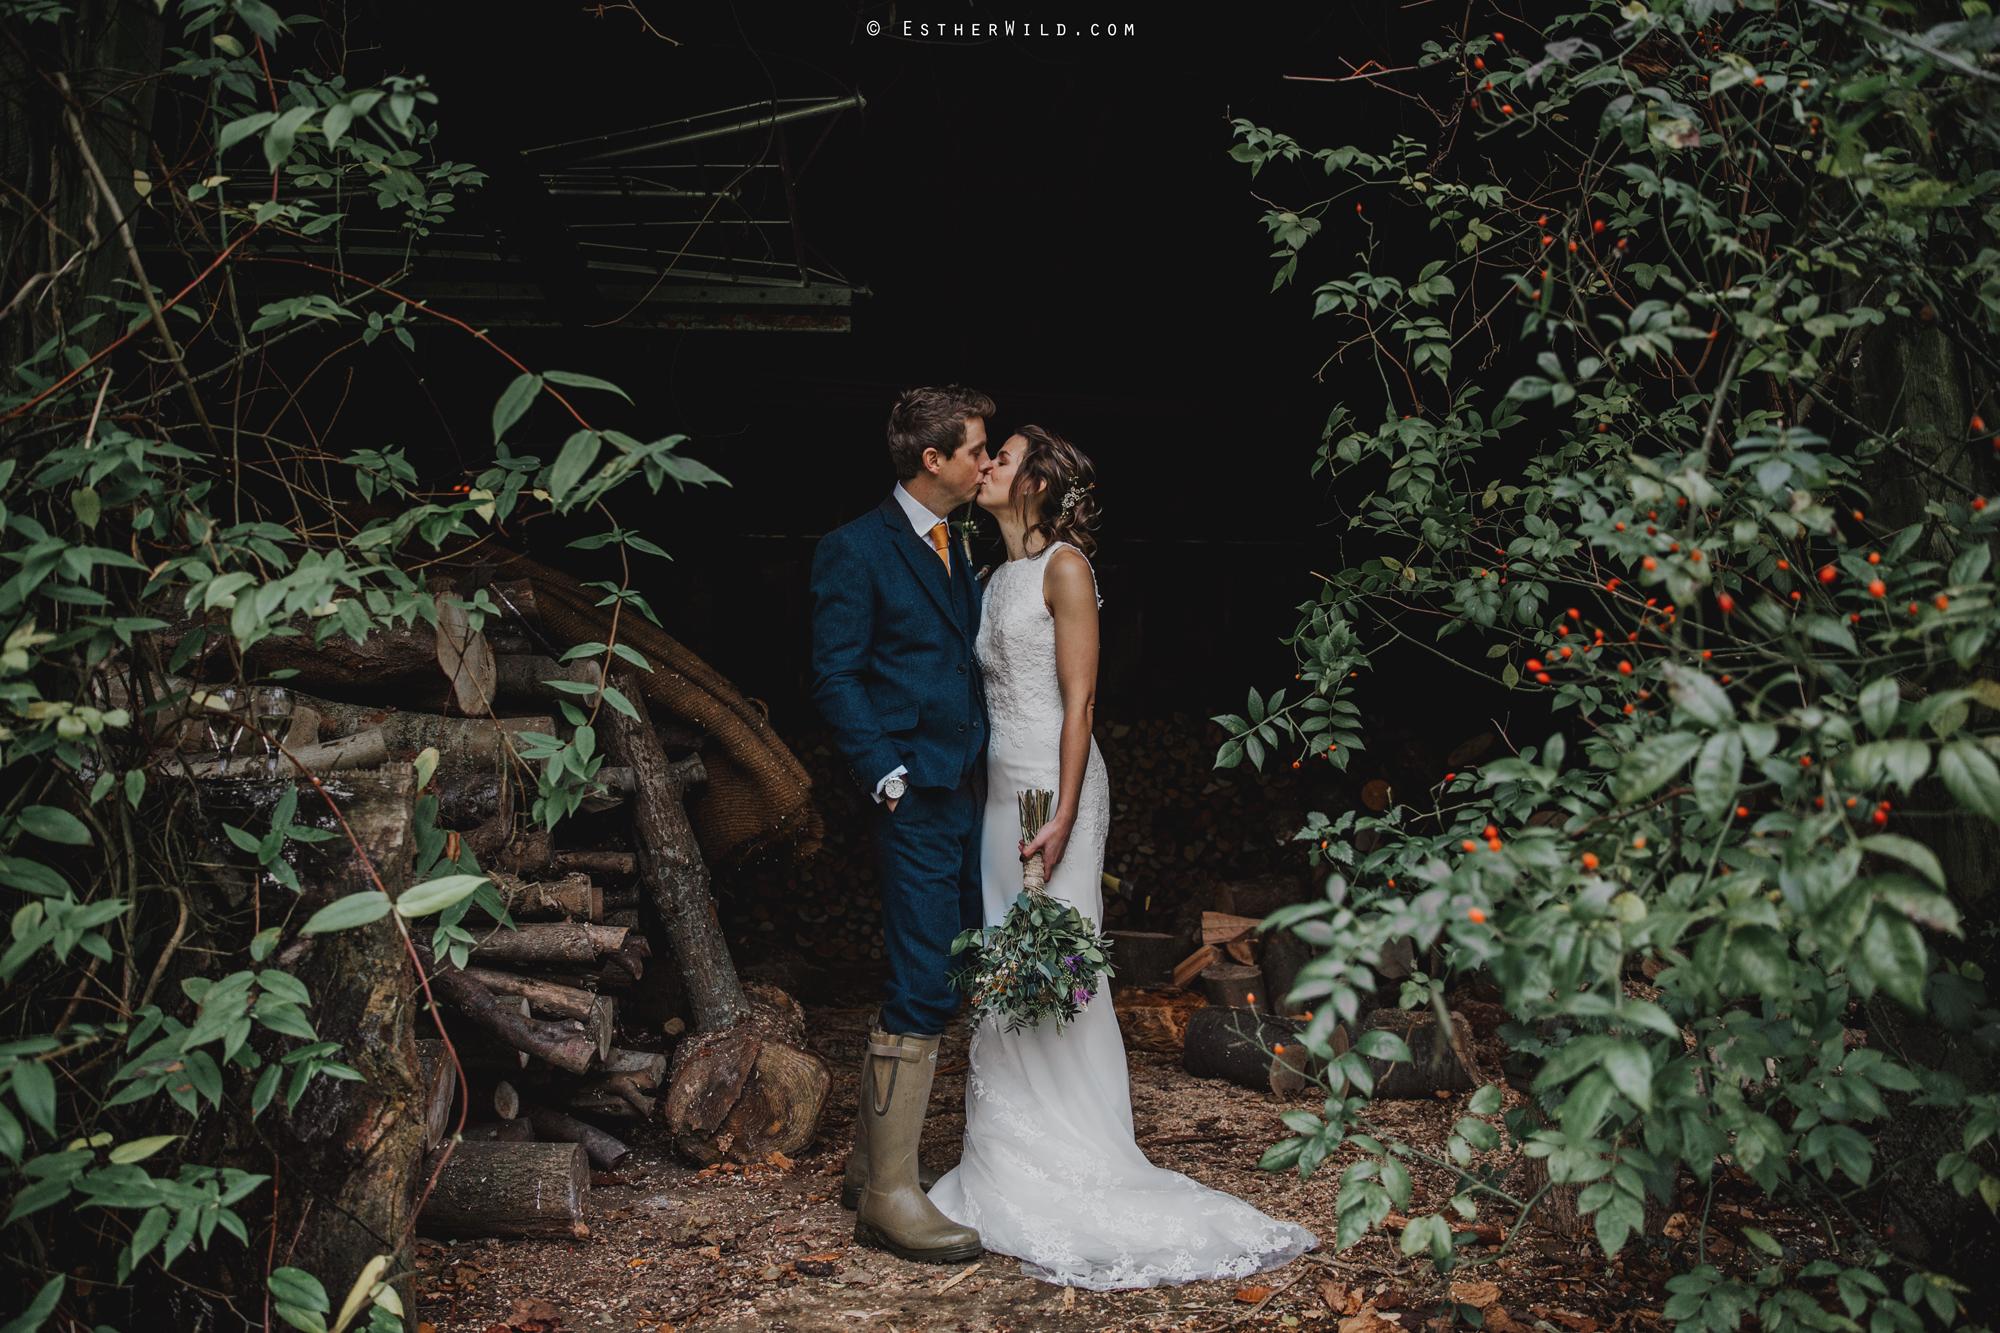 1117_Chaucer_Barn_Wedding_Photography_Esther_Wild_Norfolk_Photographer_IMG_1275.jpg